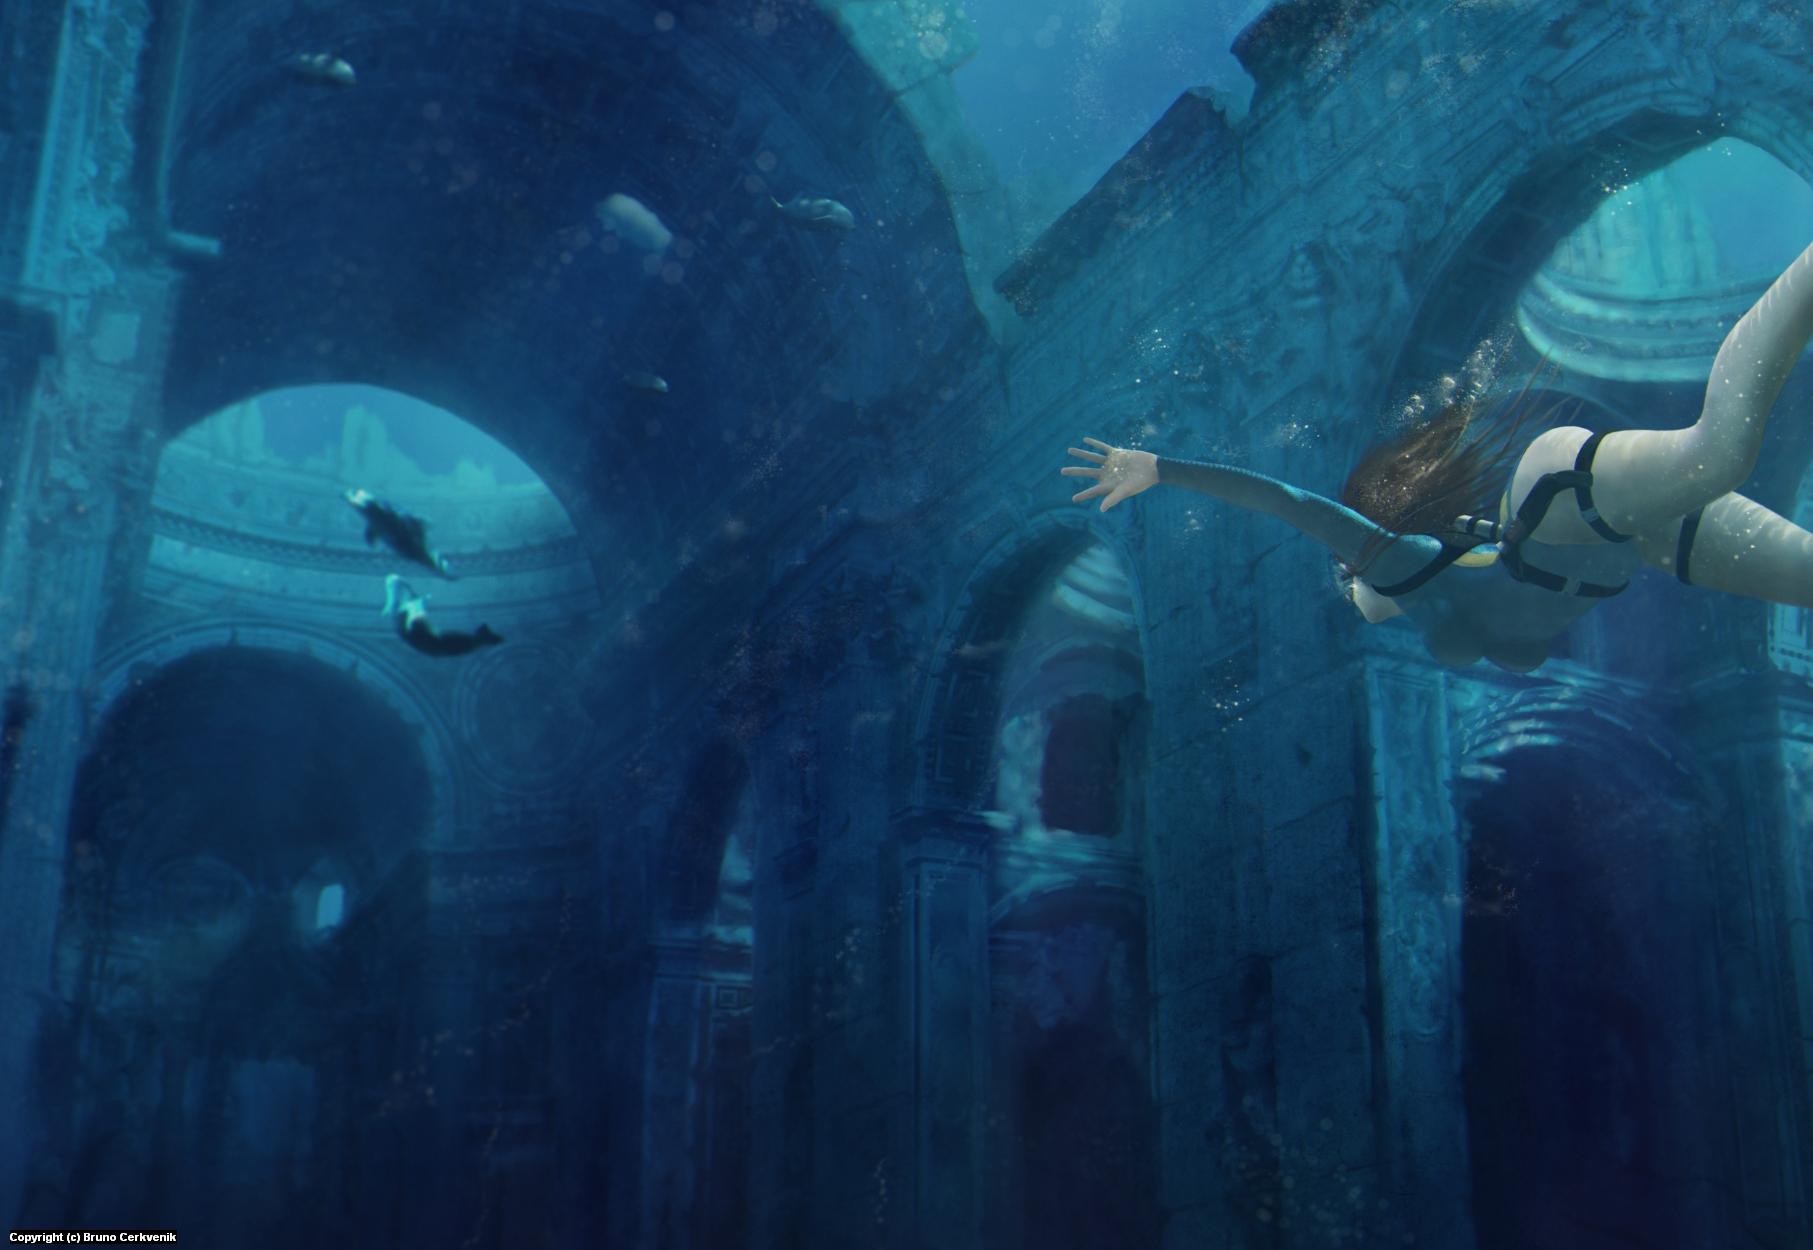 Lost City of Atlantis Artwork by Bruno Cerkvenik